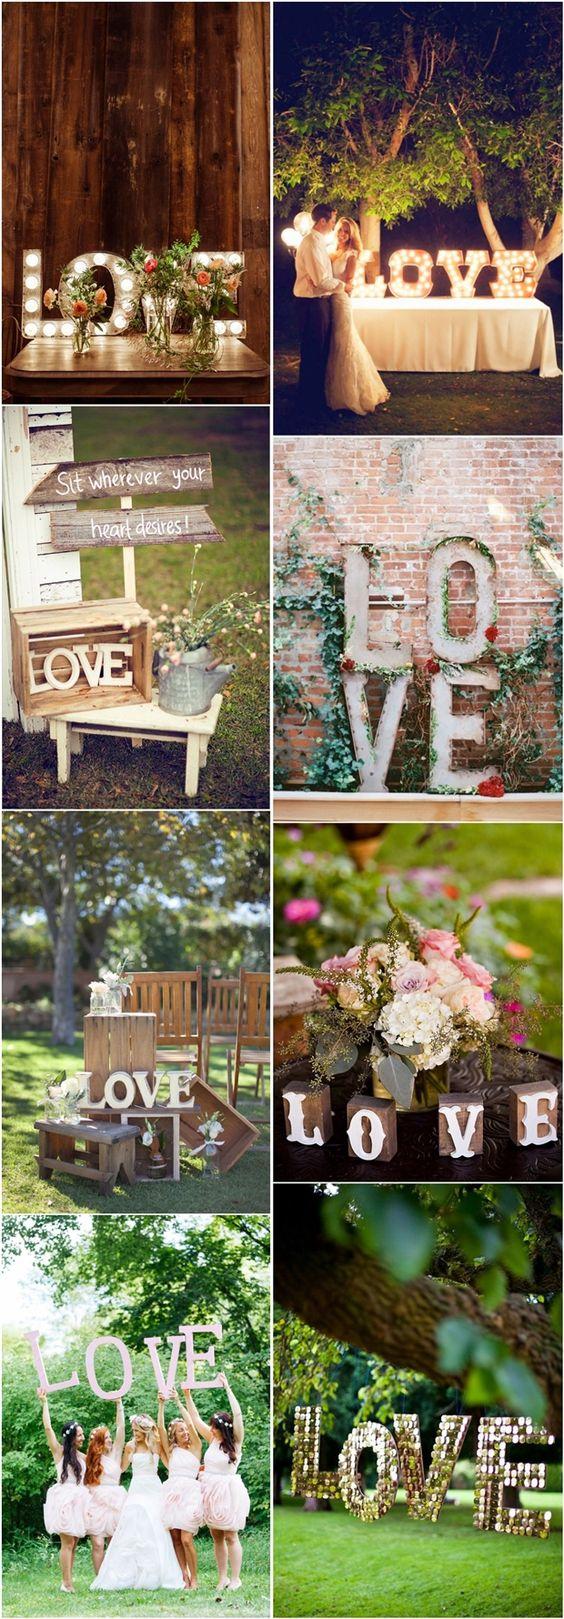 35 Awesome LOVE Letters Wedding Decor Ideas | http://www.deerpearlflowers.com/35-awesome-love-letters-wedding-decor-ideas/: